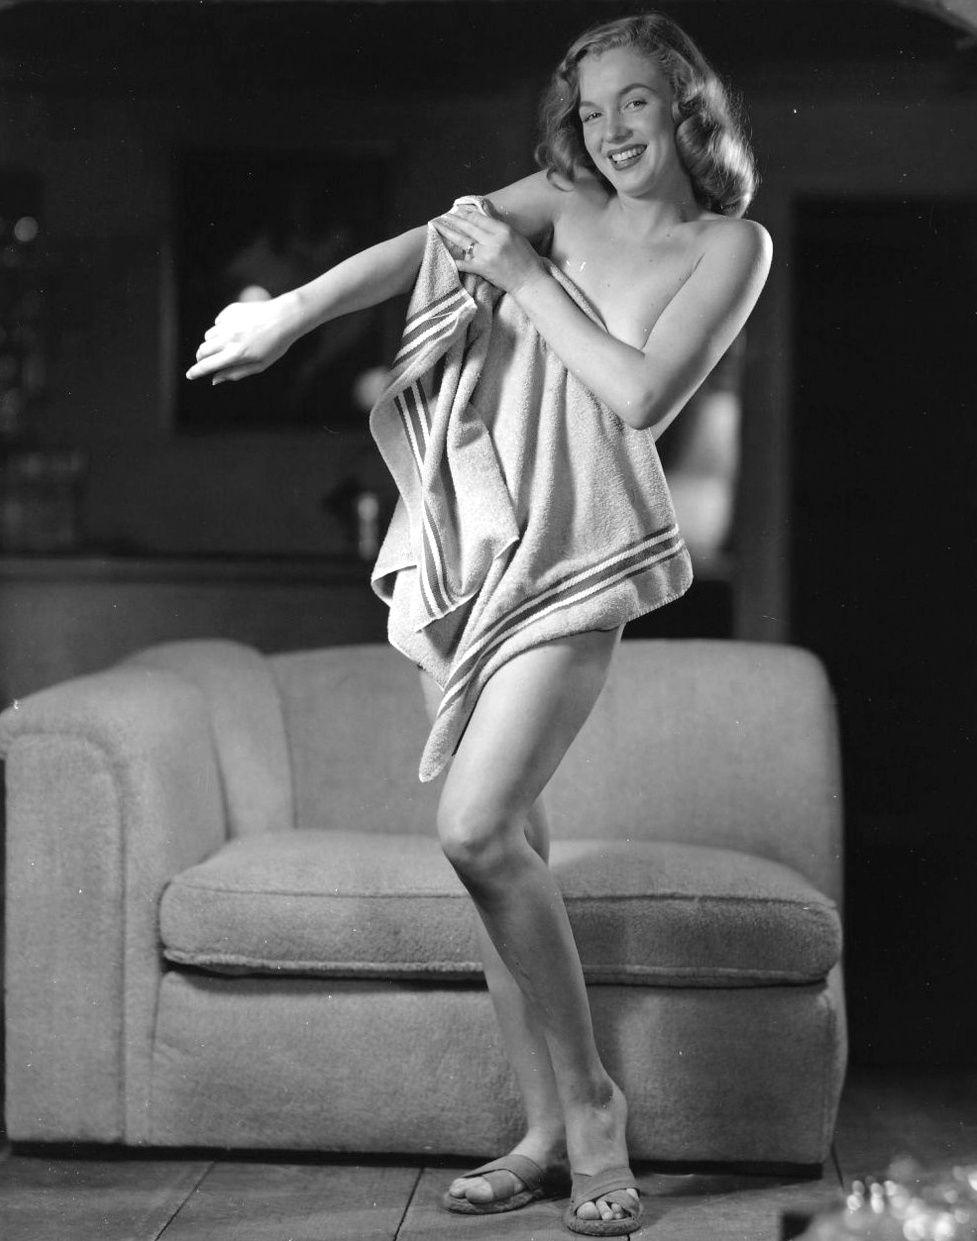 Pin by Alan Boenning on Adult Marilyn Monroe Norma Jean